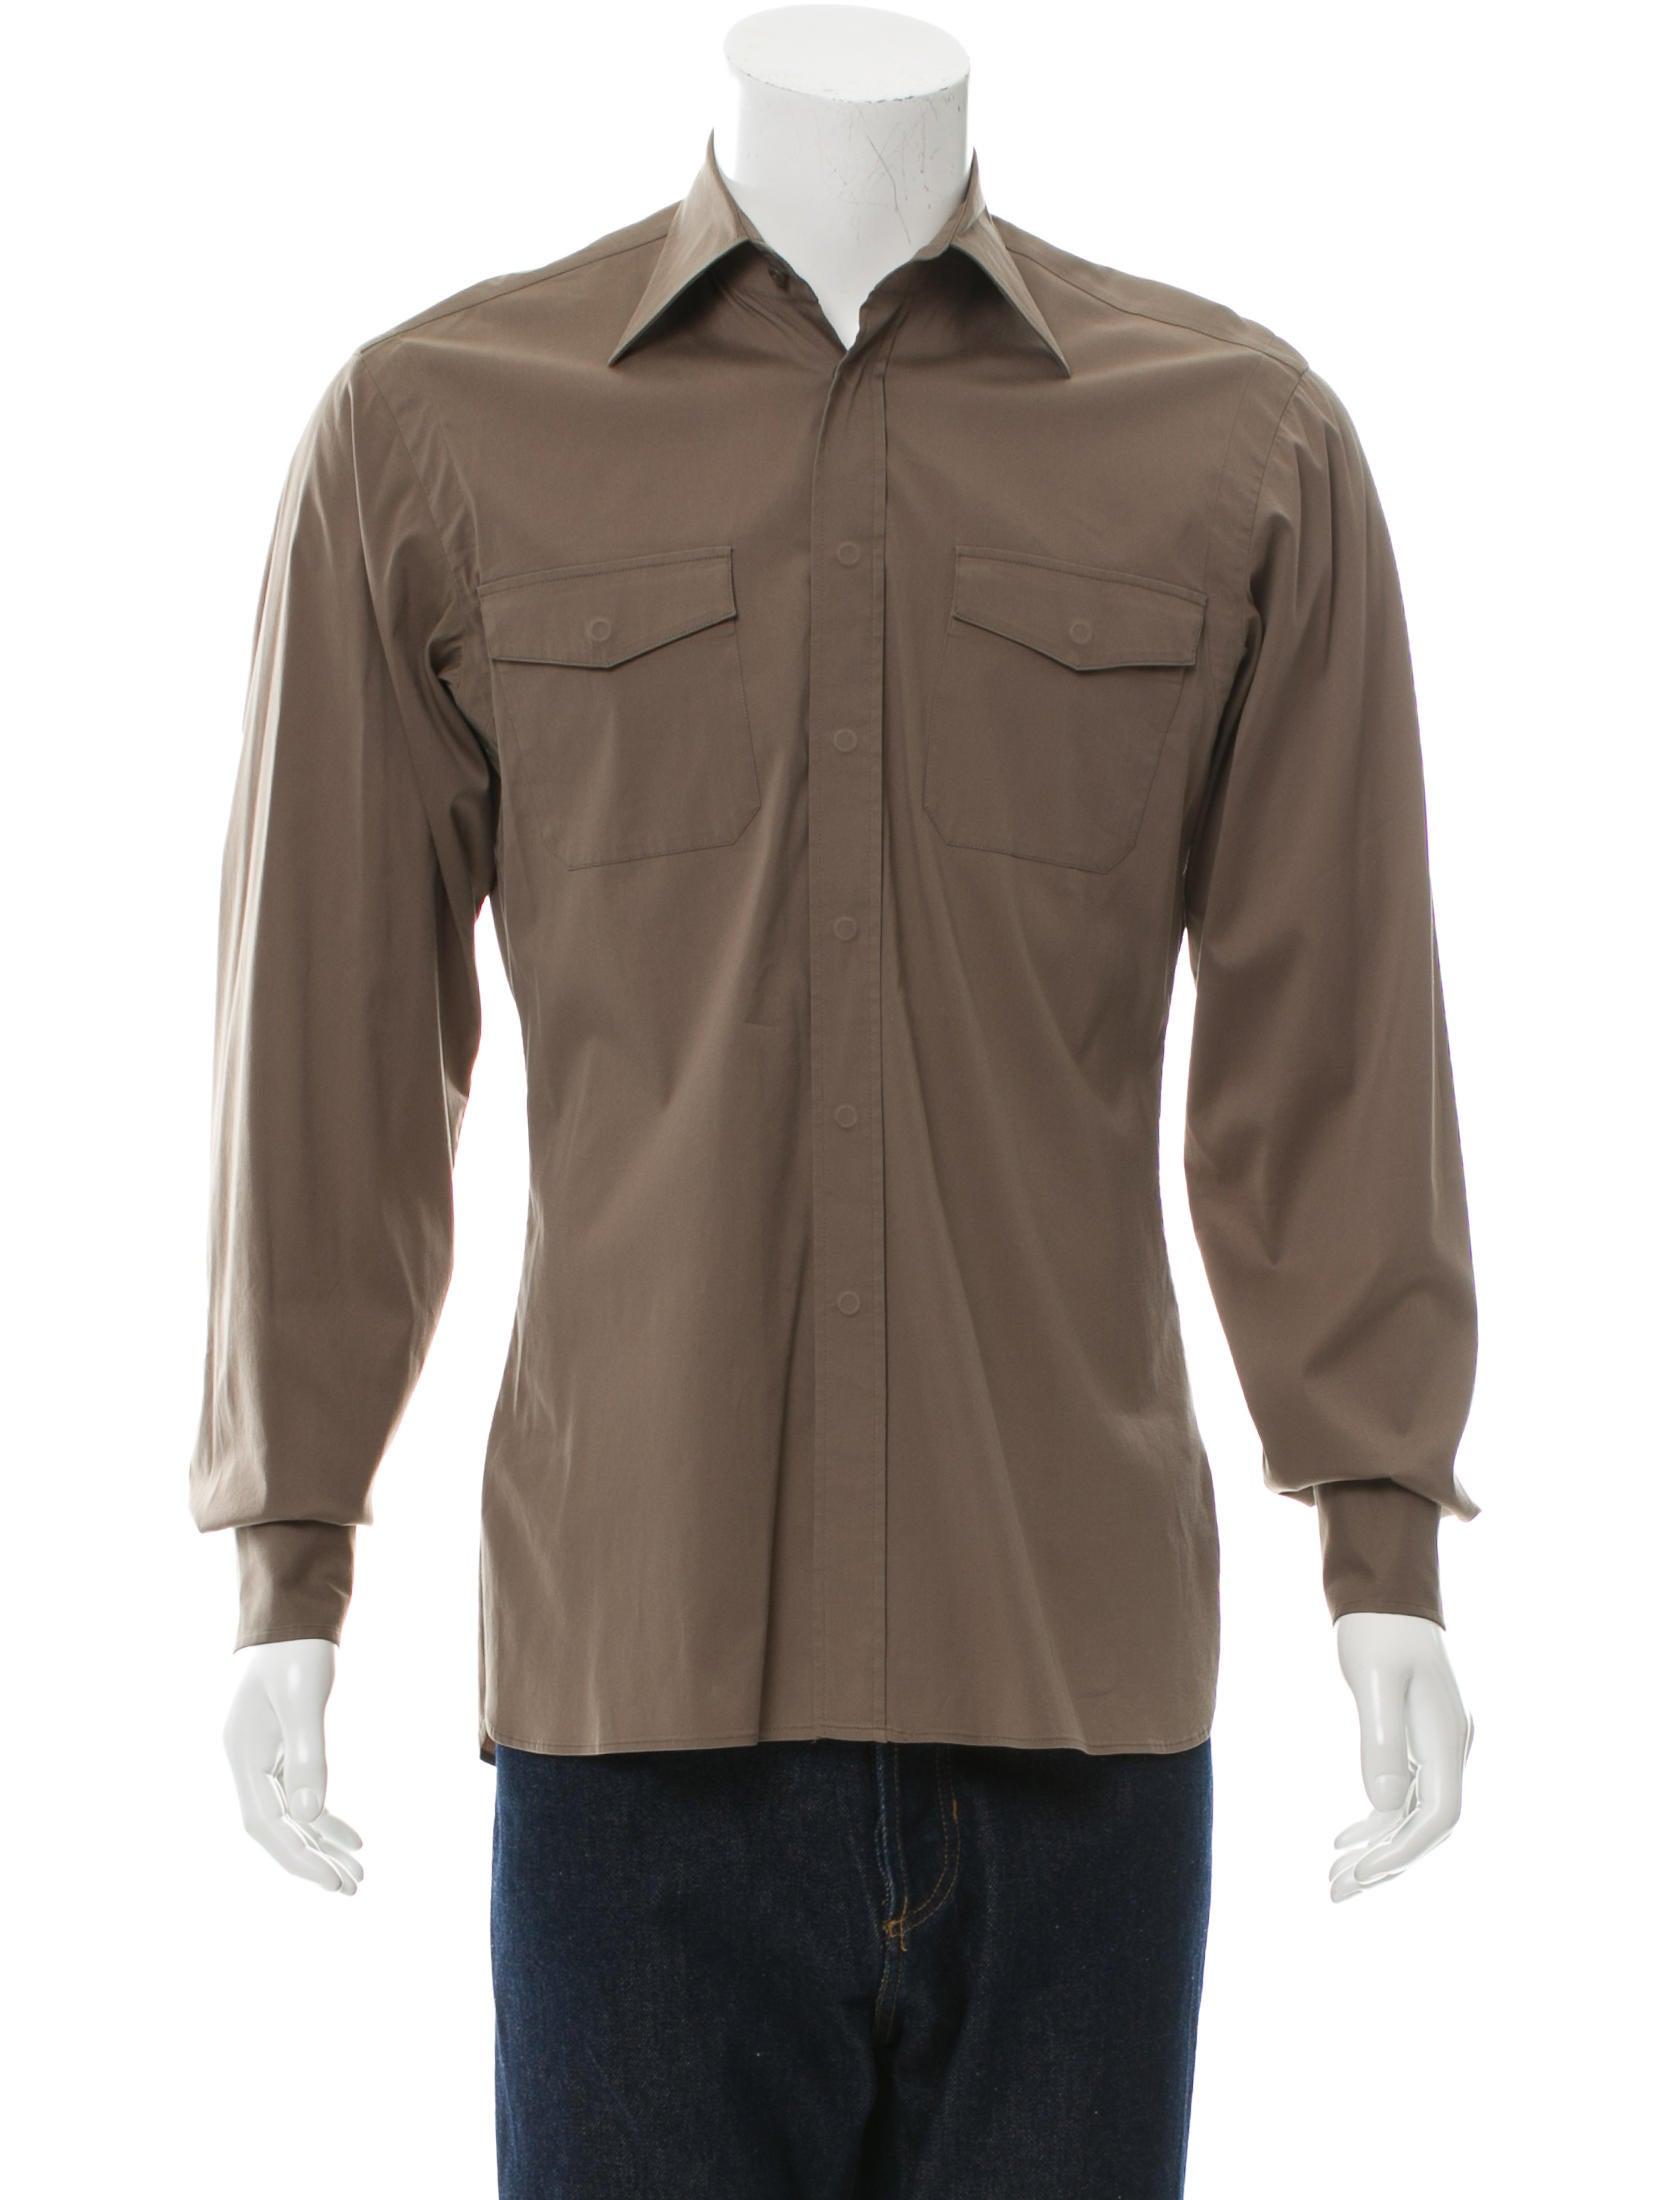 Prada Long Sleeve Button Up Shirt Clothing Pra116579